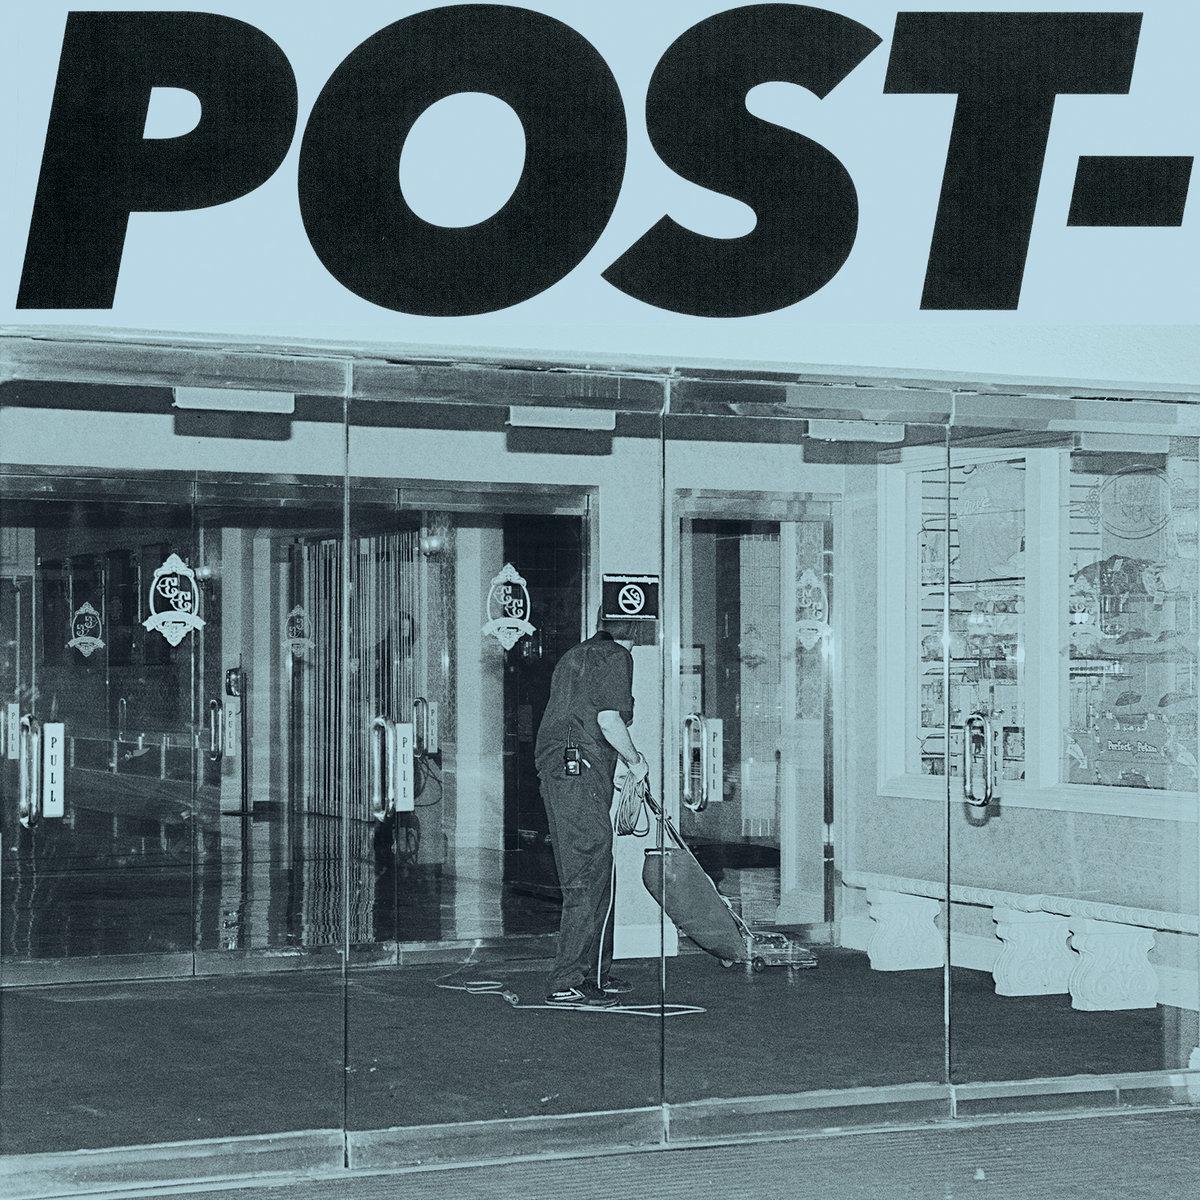 Jeff Rosenstock Post review